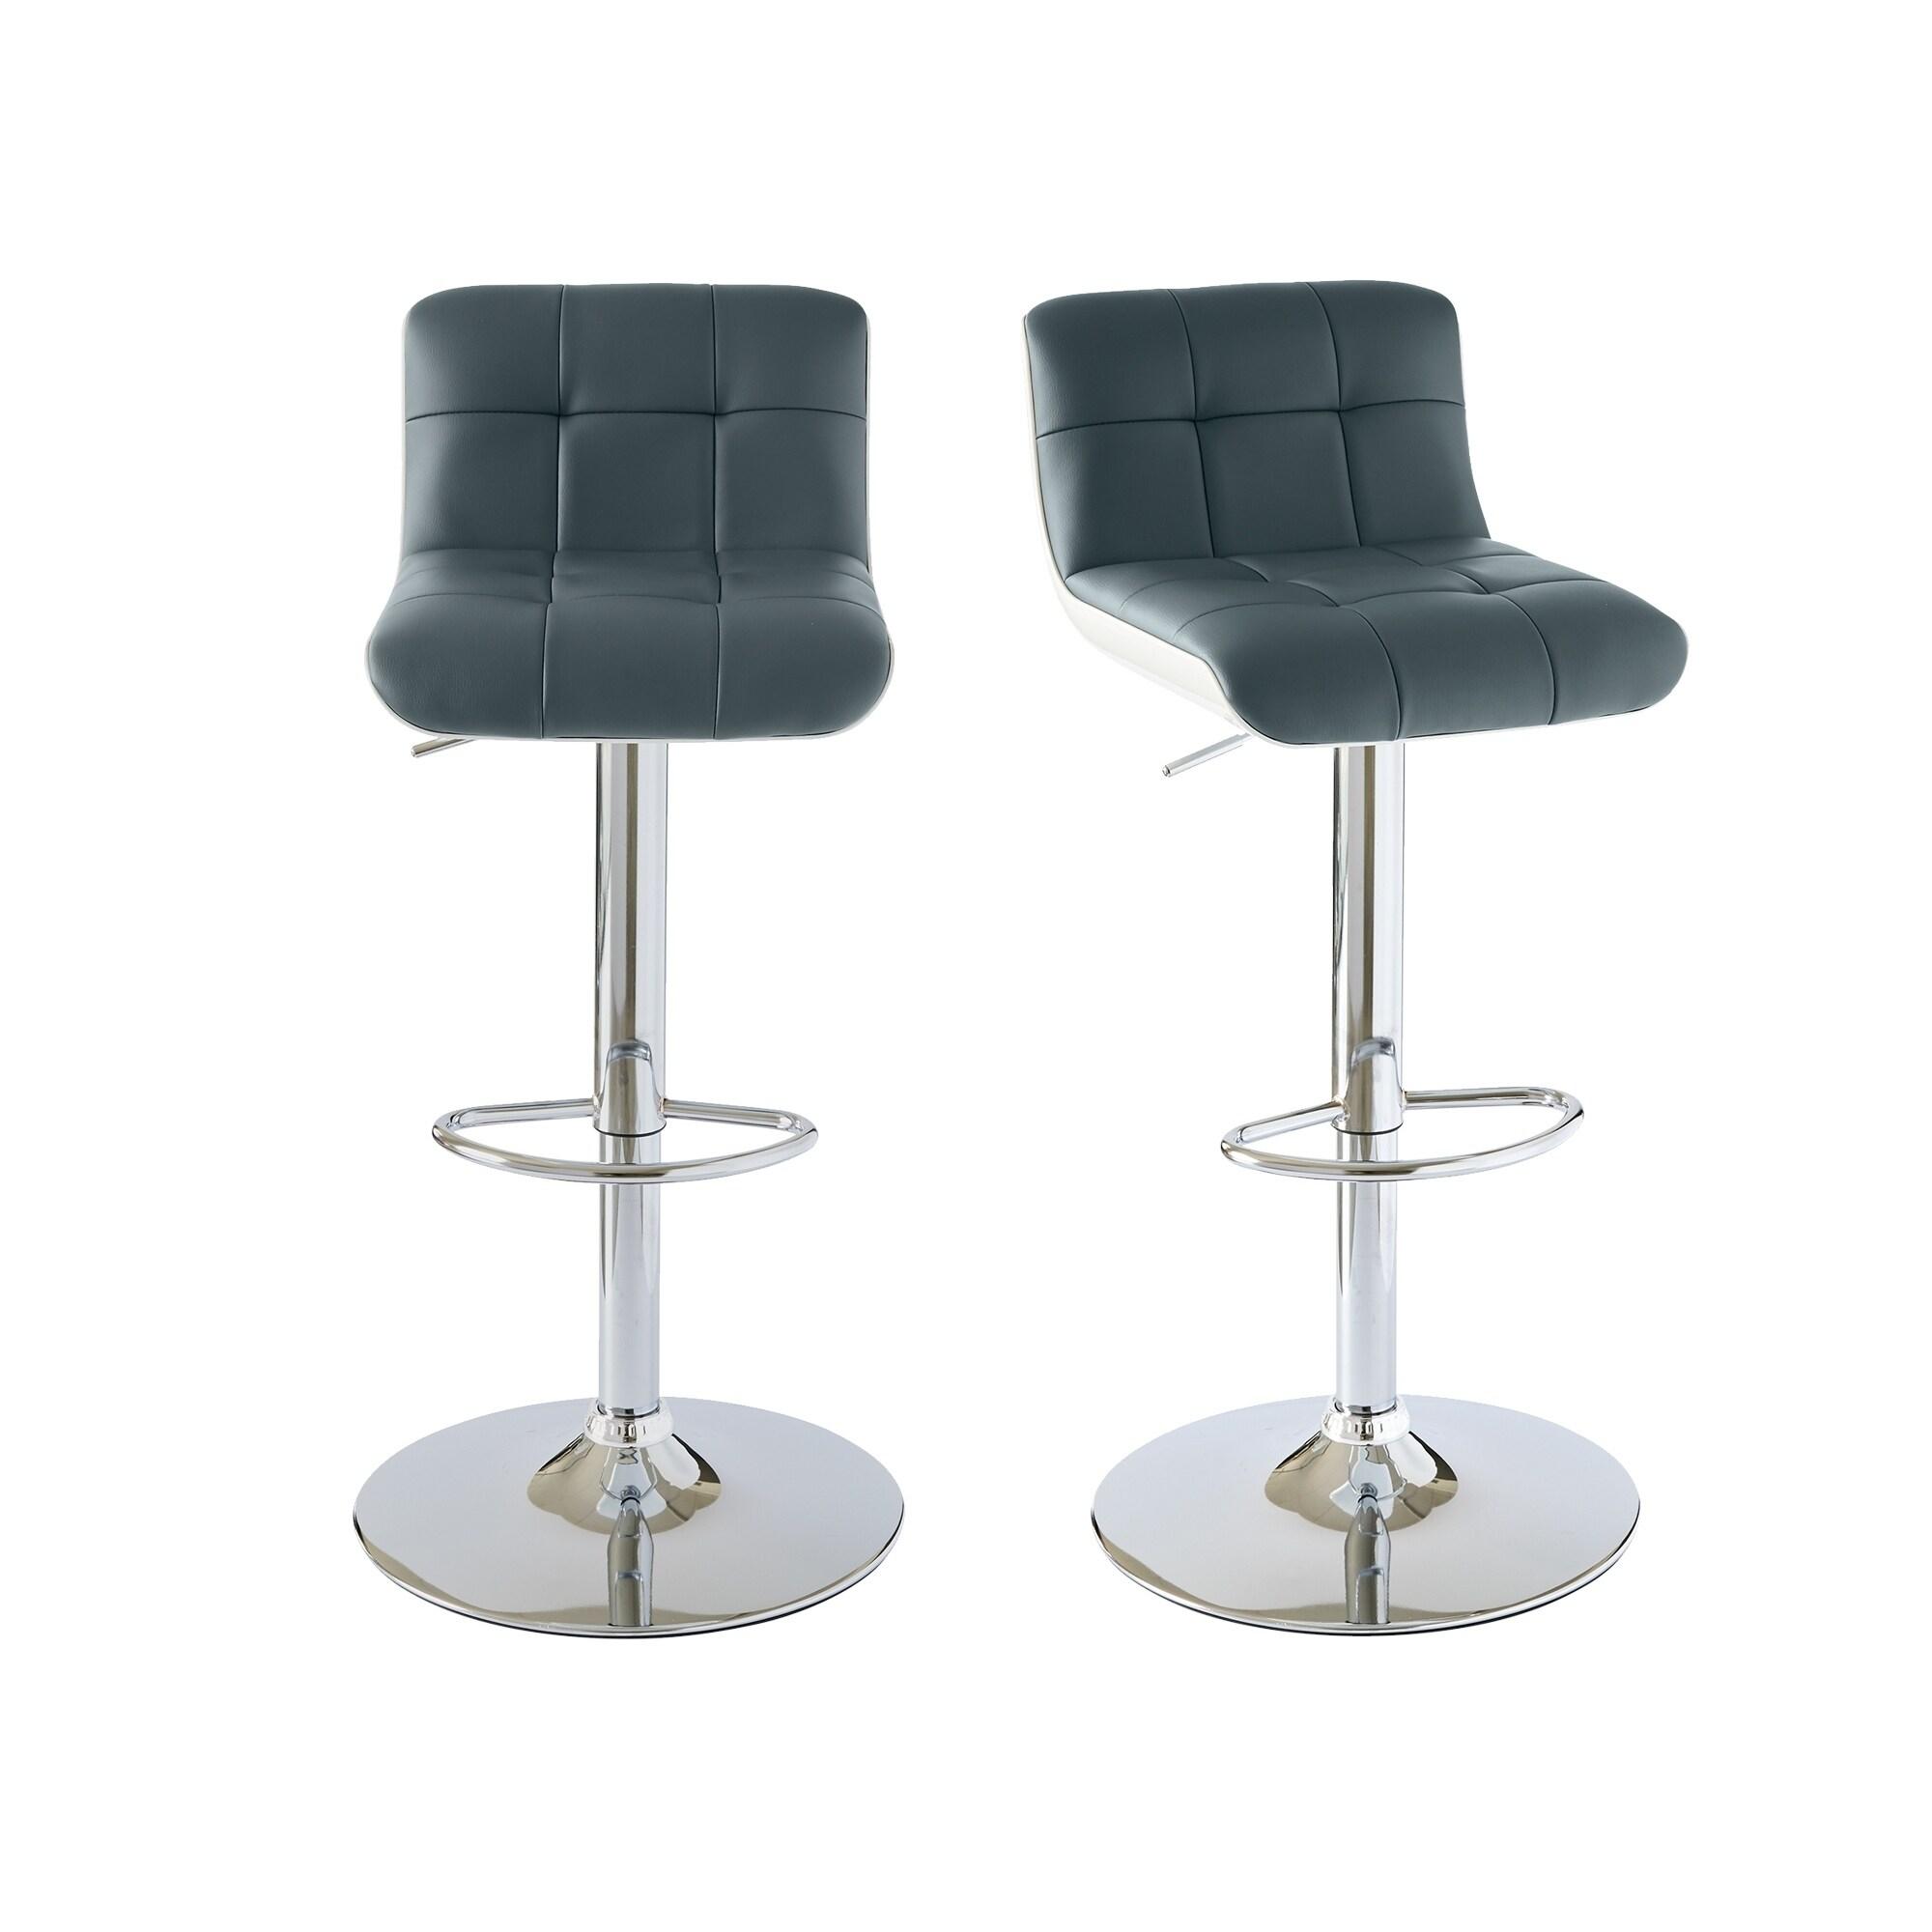 Sensational Picket House Furnishings Becca Adjustable Swivel Bar Stool Set Uwap Interior Chair Design Uwaporg